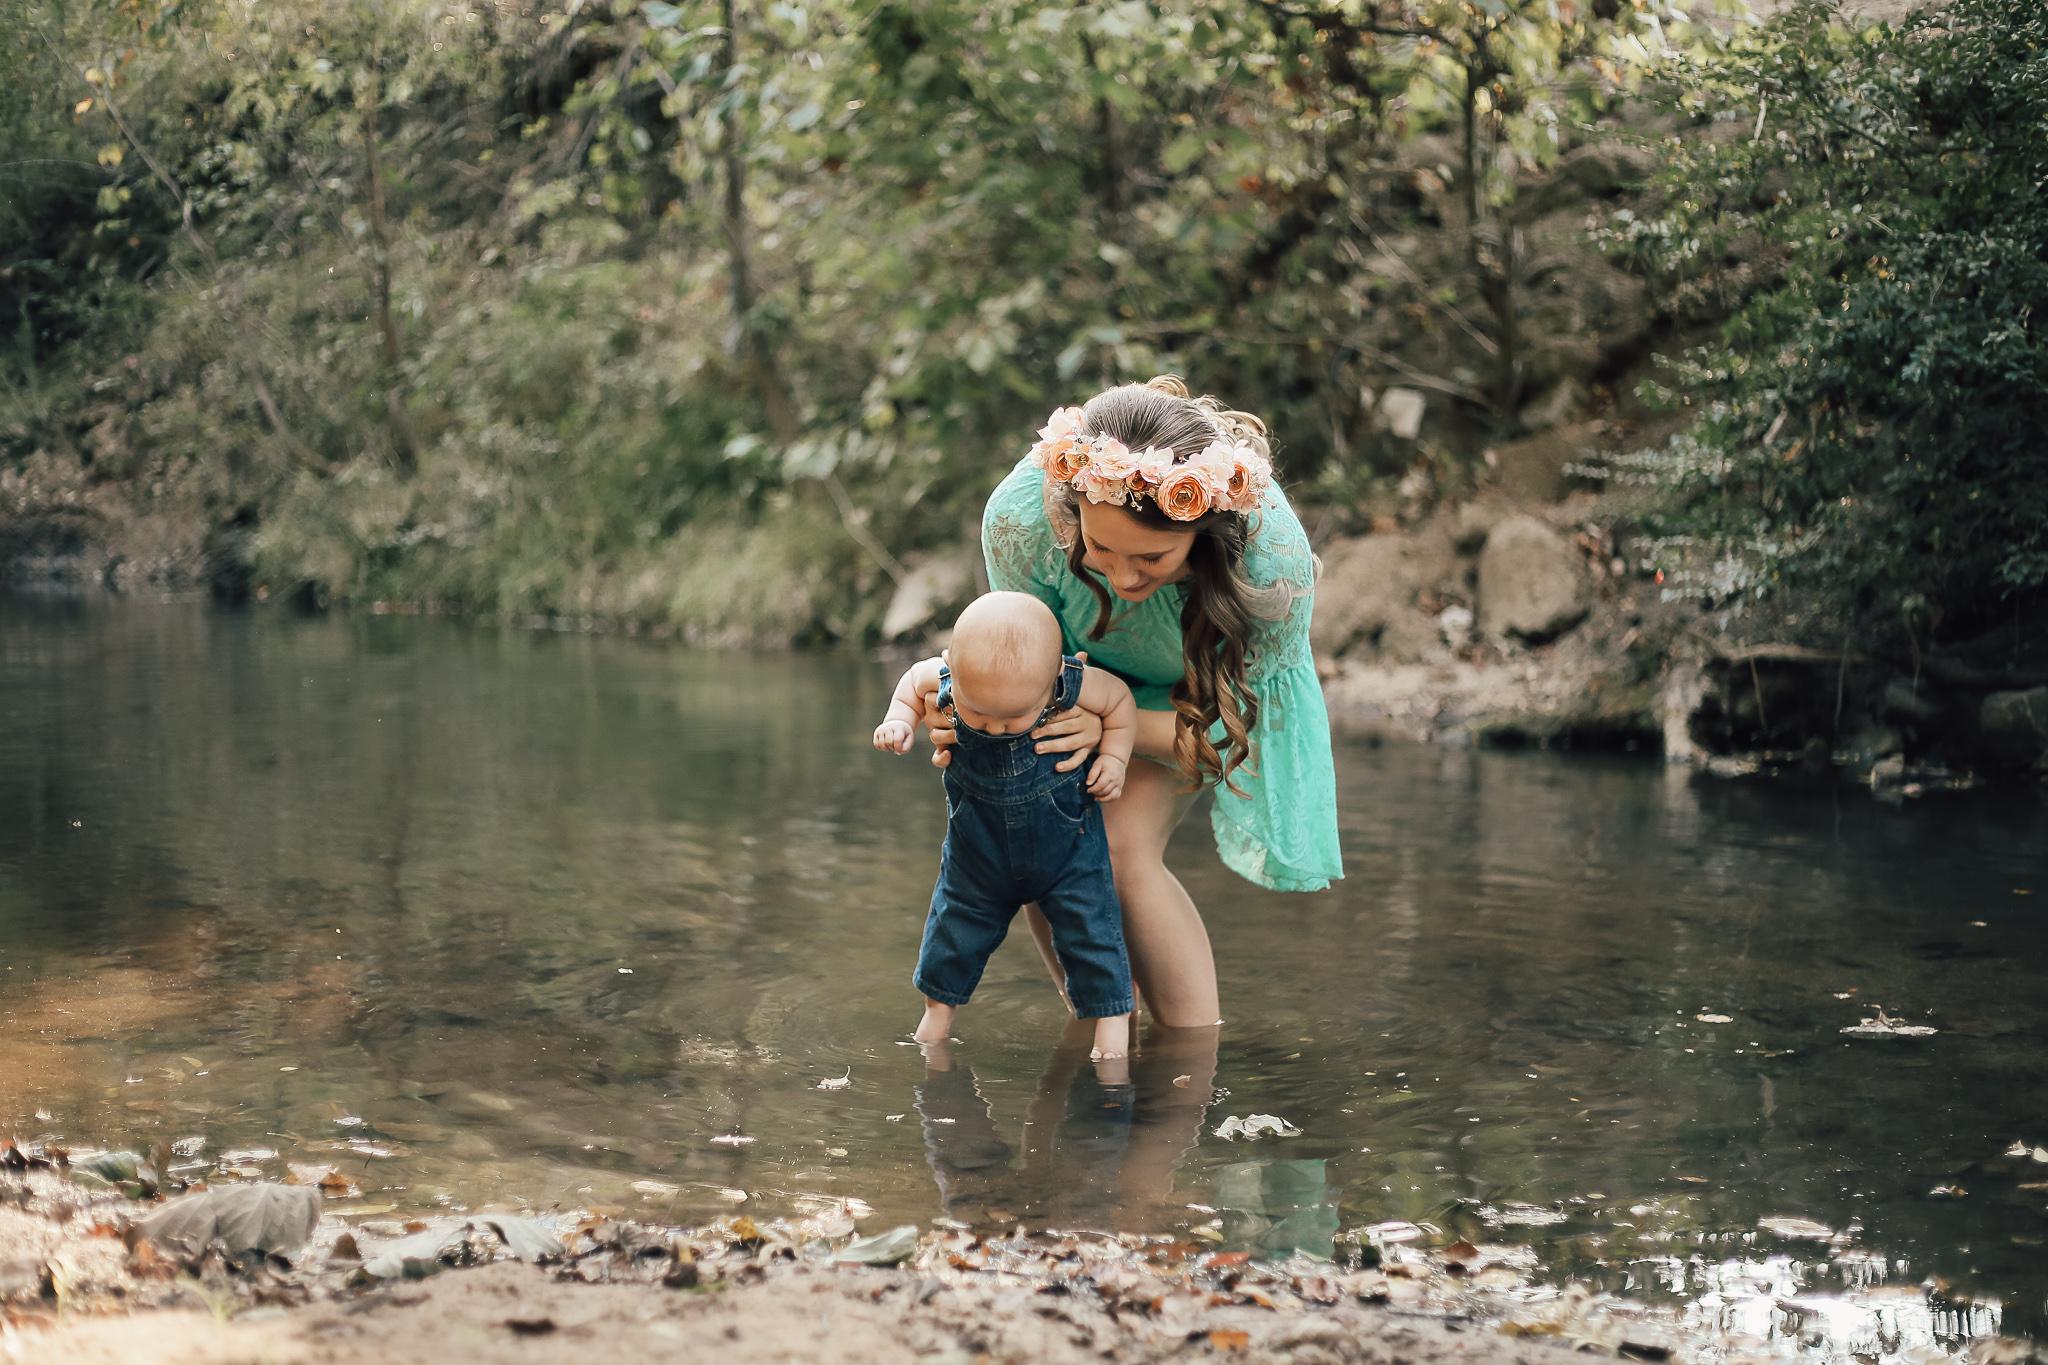 cassie-cook-photography-memphis-family-photographer-breastfeeding-creek